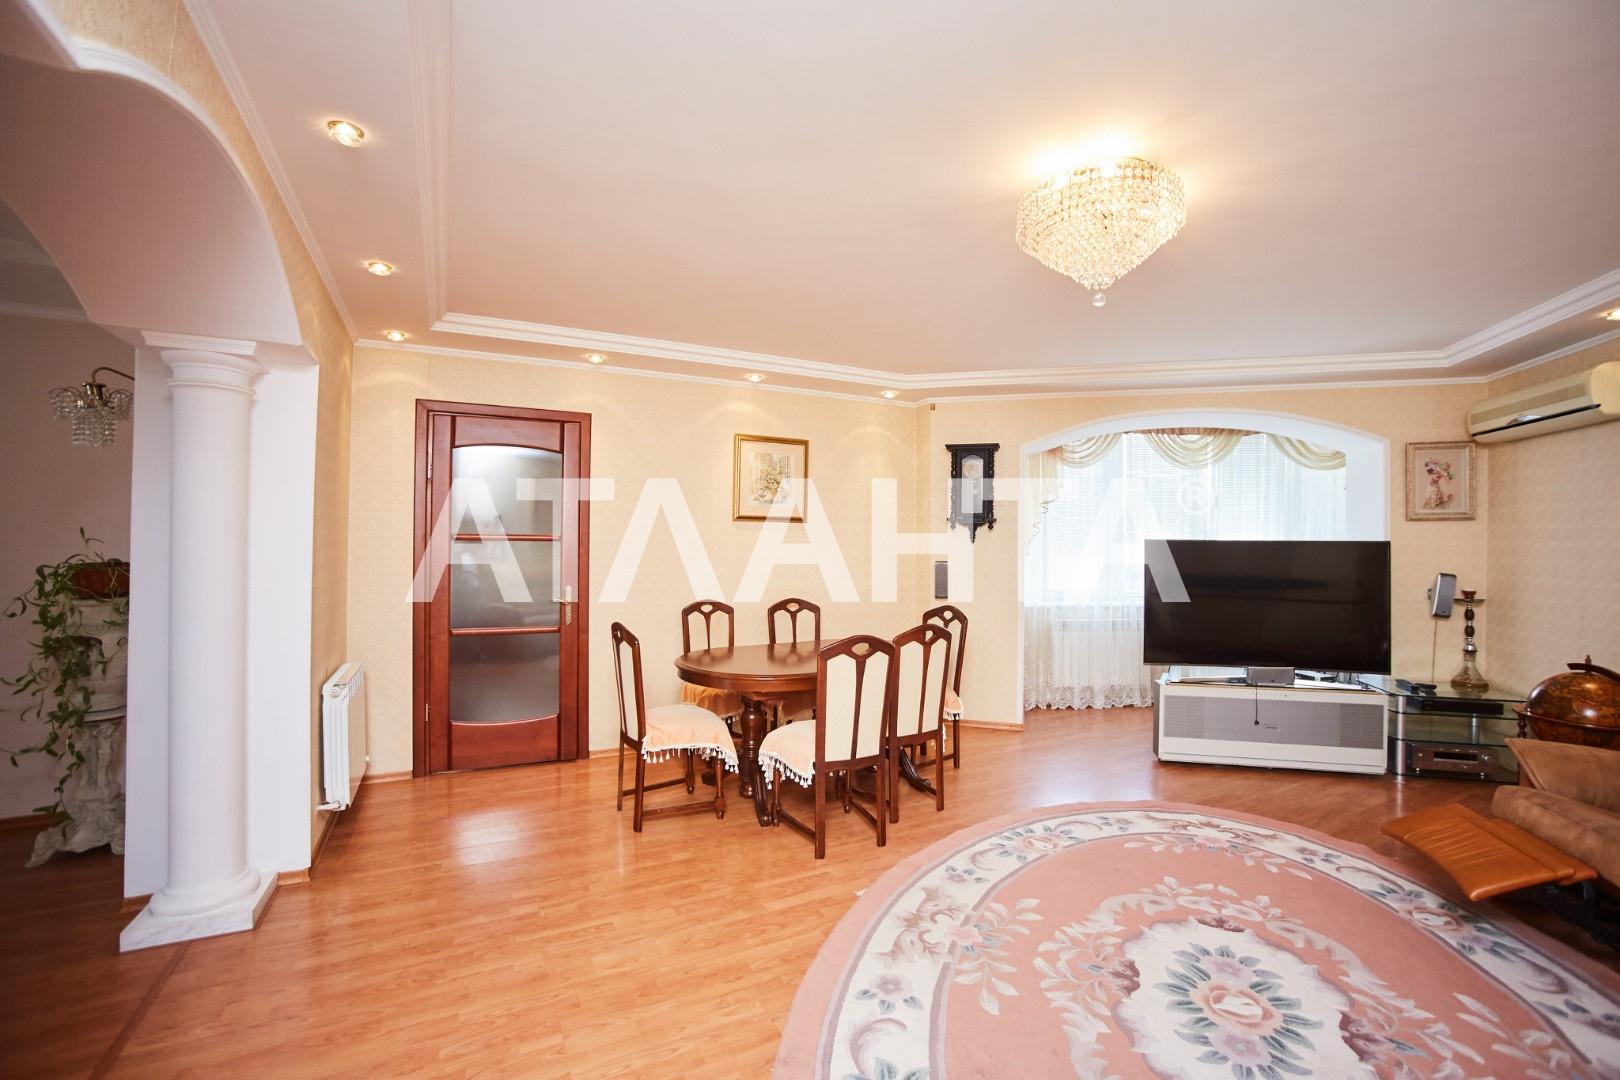 Продается Многоуровневая Квартира на ул. Посмитного — 295 000 у.е. (фото №13)